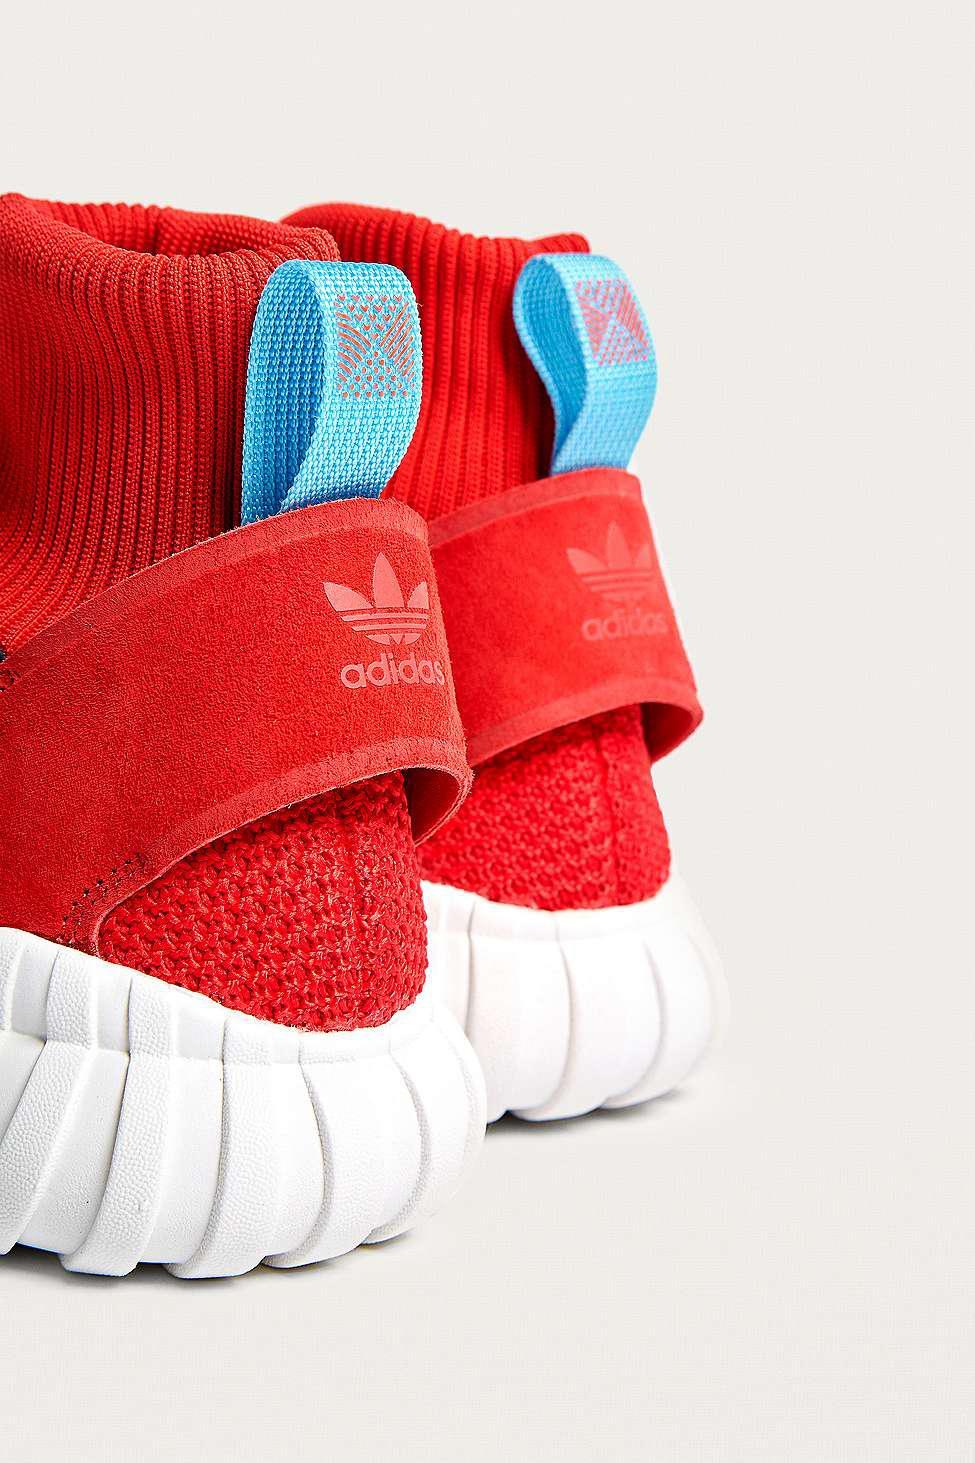 adidas Originals Tubular Doom Winter High-top Trainers in Red